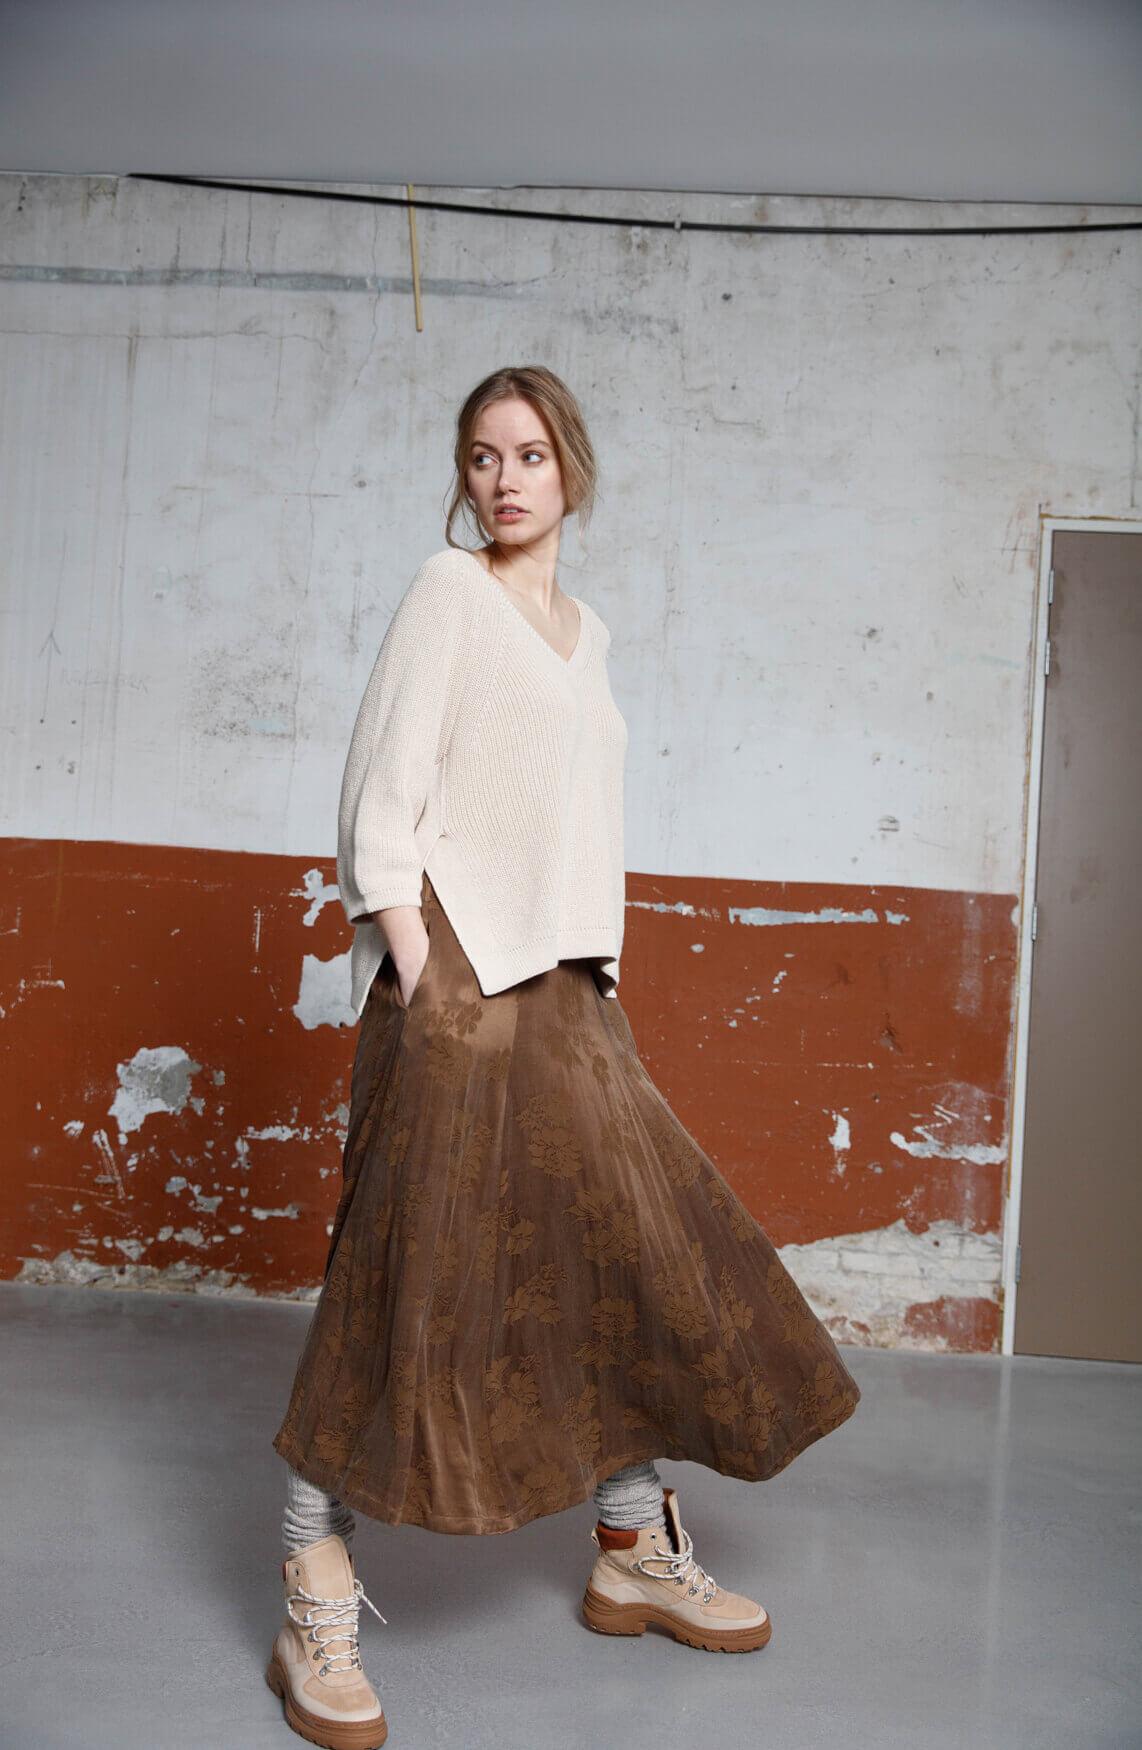 Moscow Dames Kadisya floral skirt Bruin